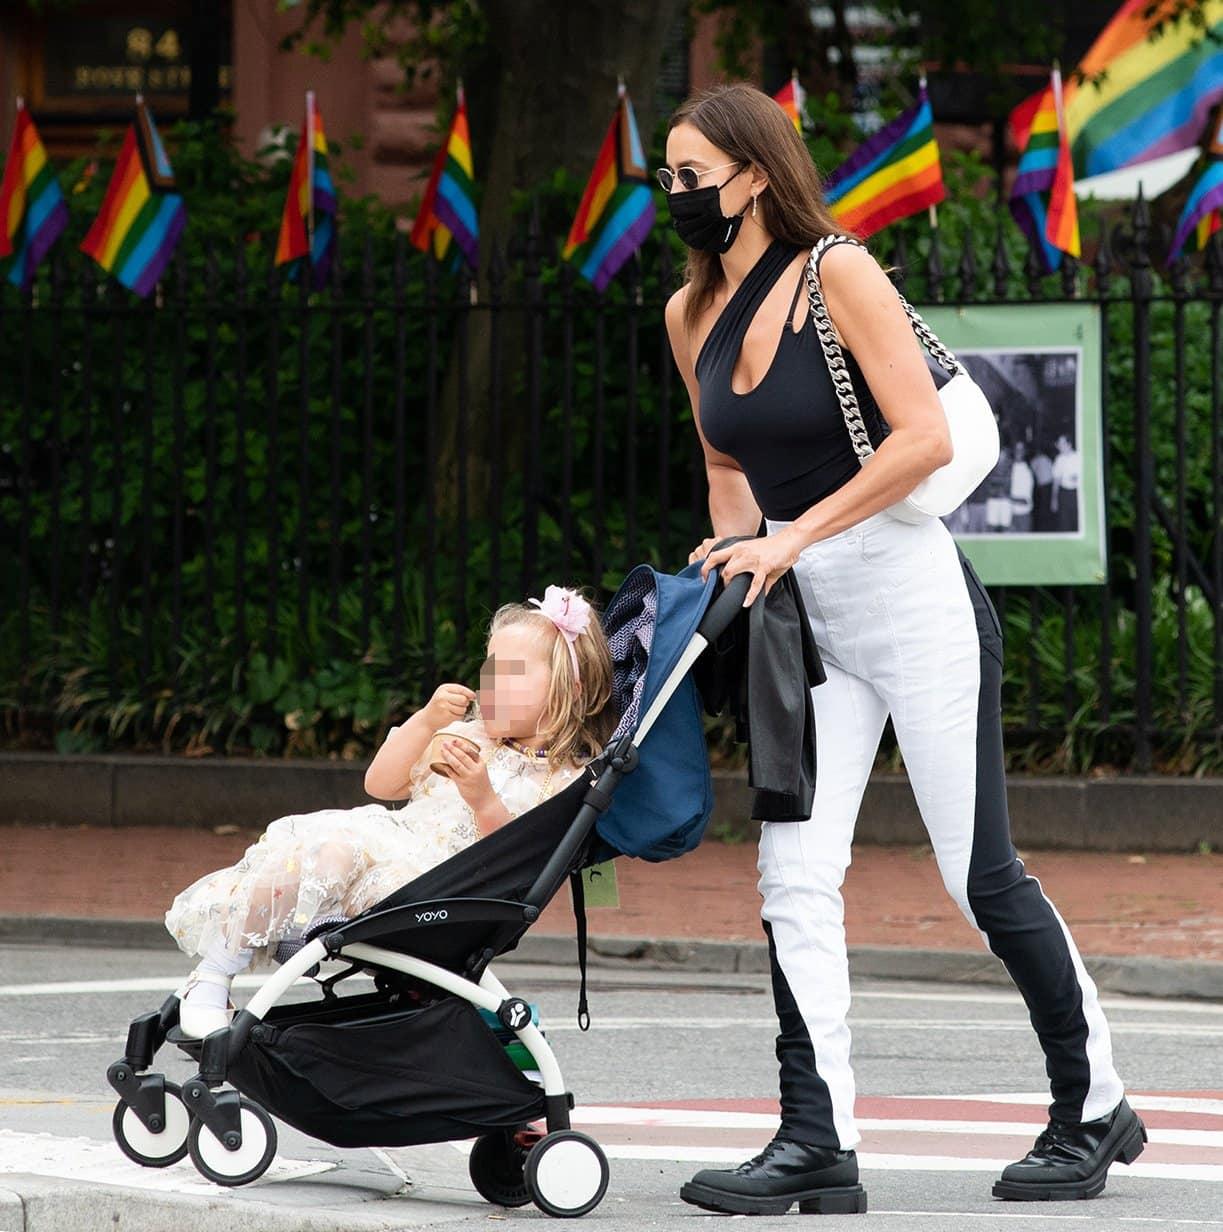 Irina Shayk picks up her daughter Lea from school in Chelsea, New York on June 4, 2021